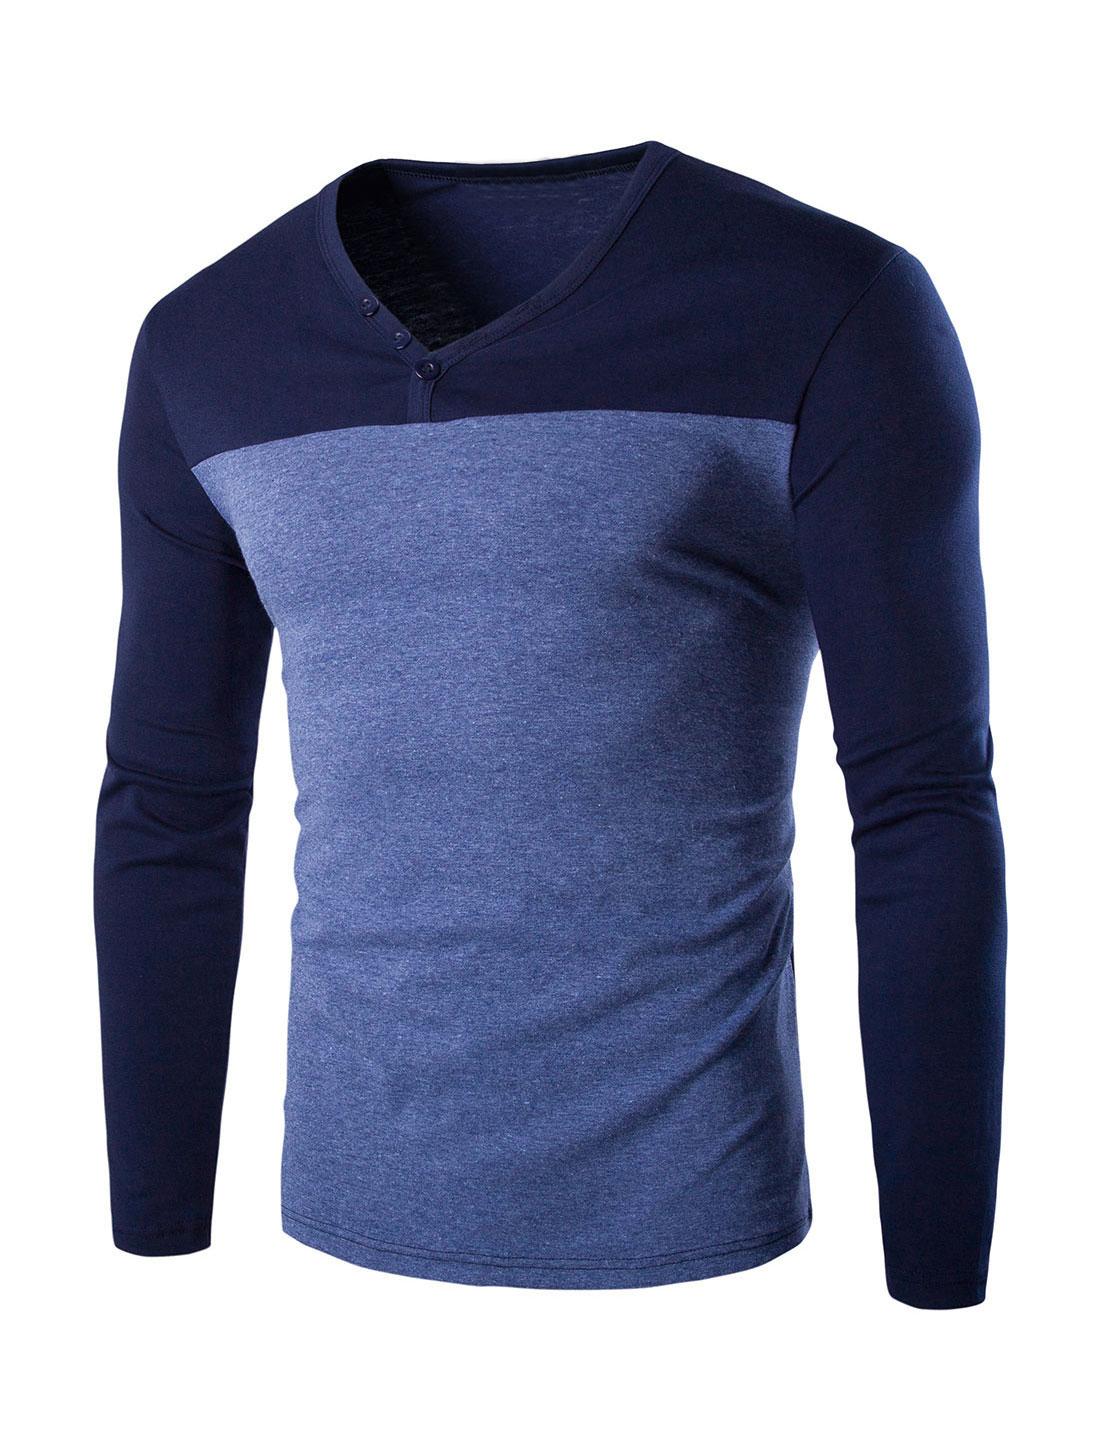 Men V-Neck Color Block Buttons Upper Long Sleeves T-shirt Blue M